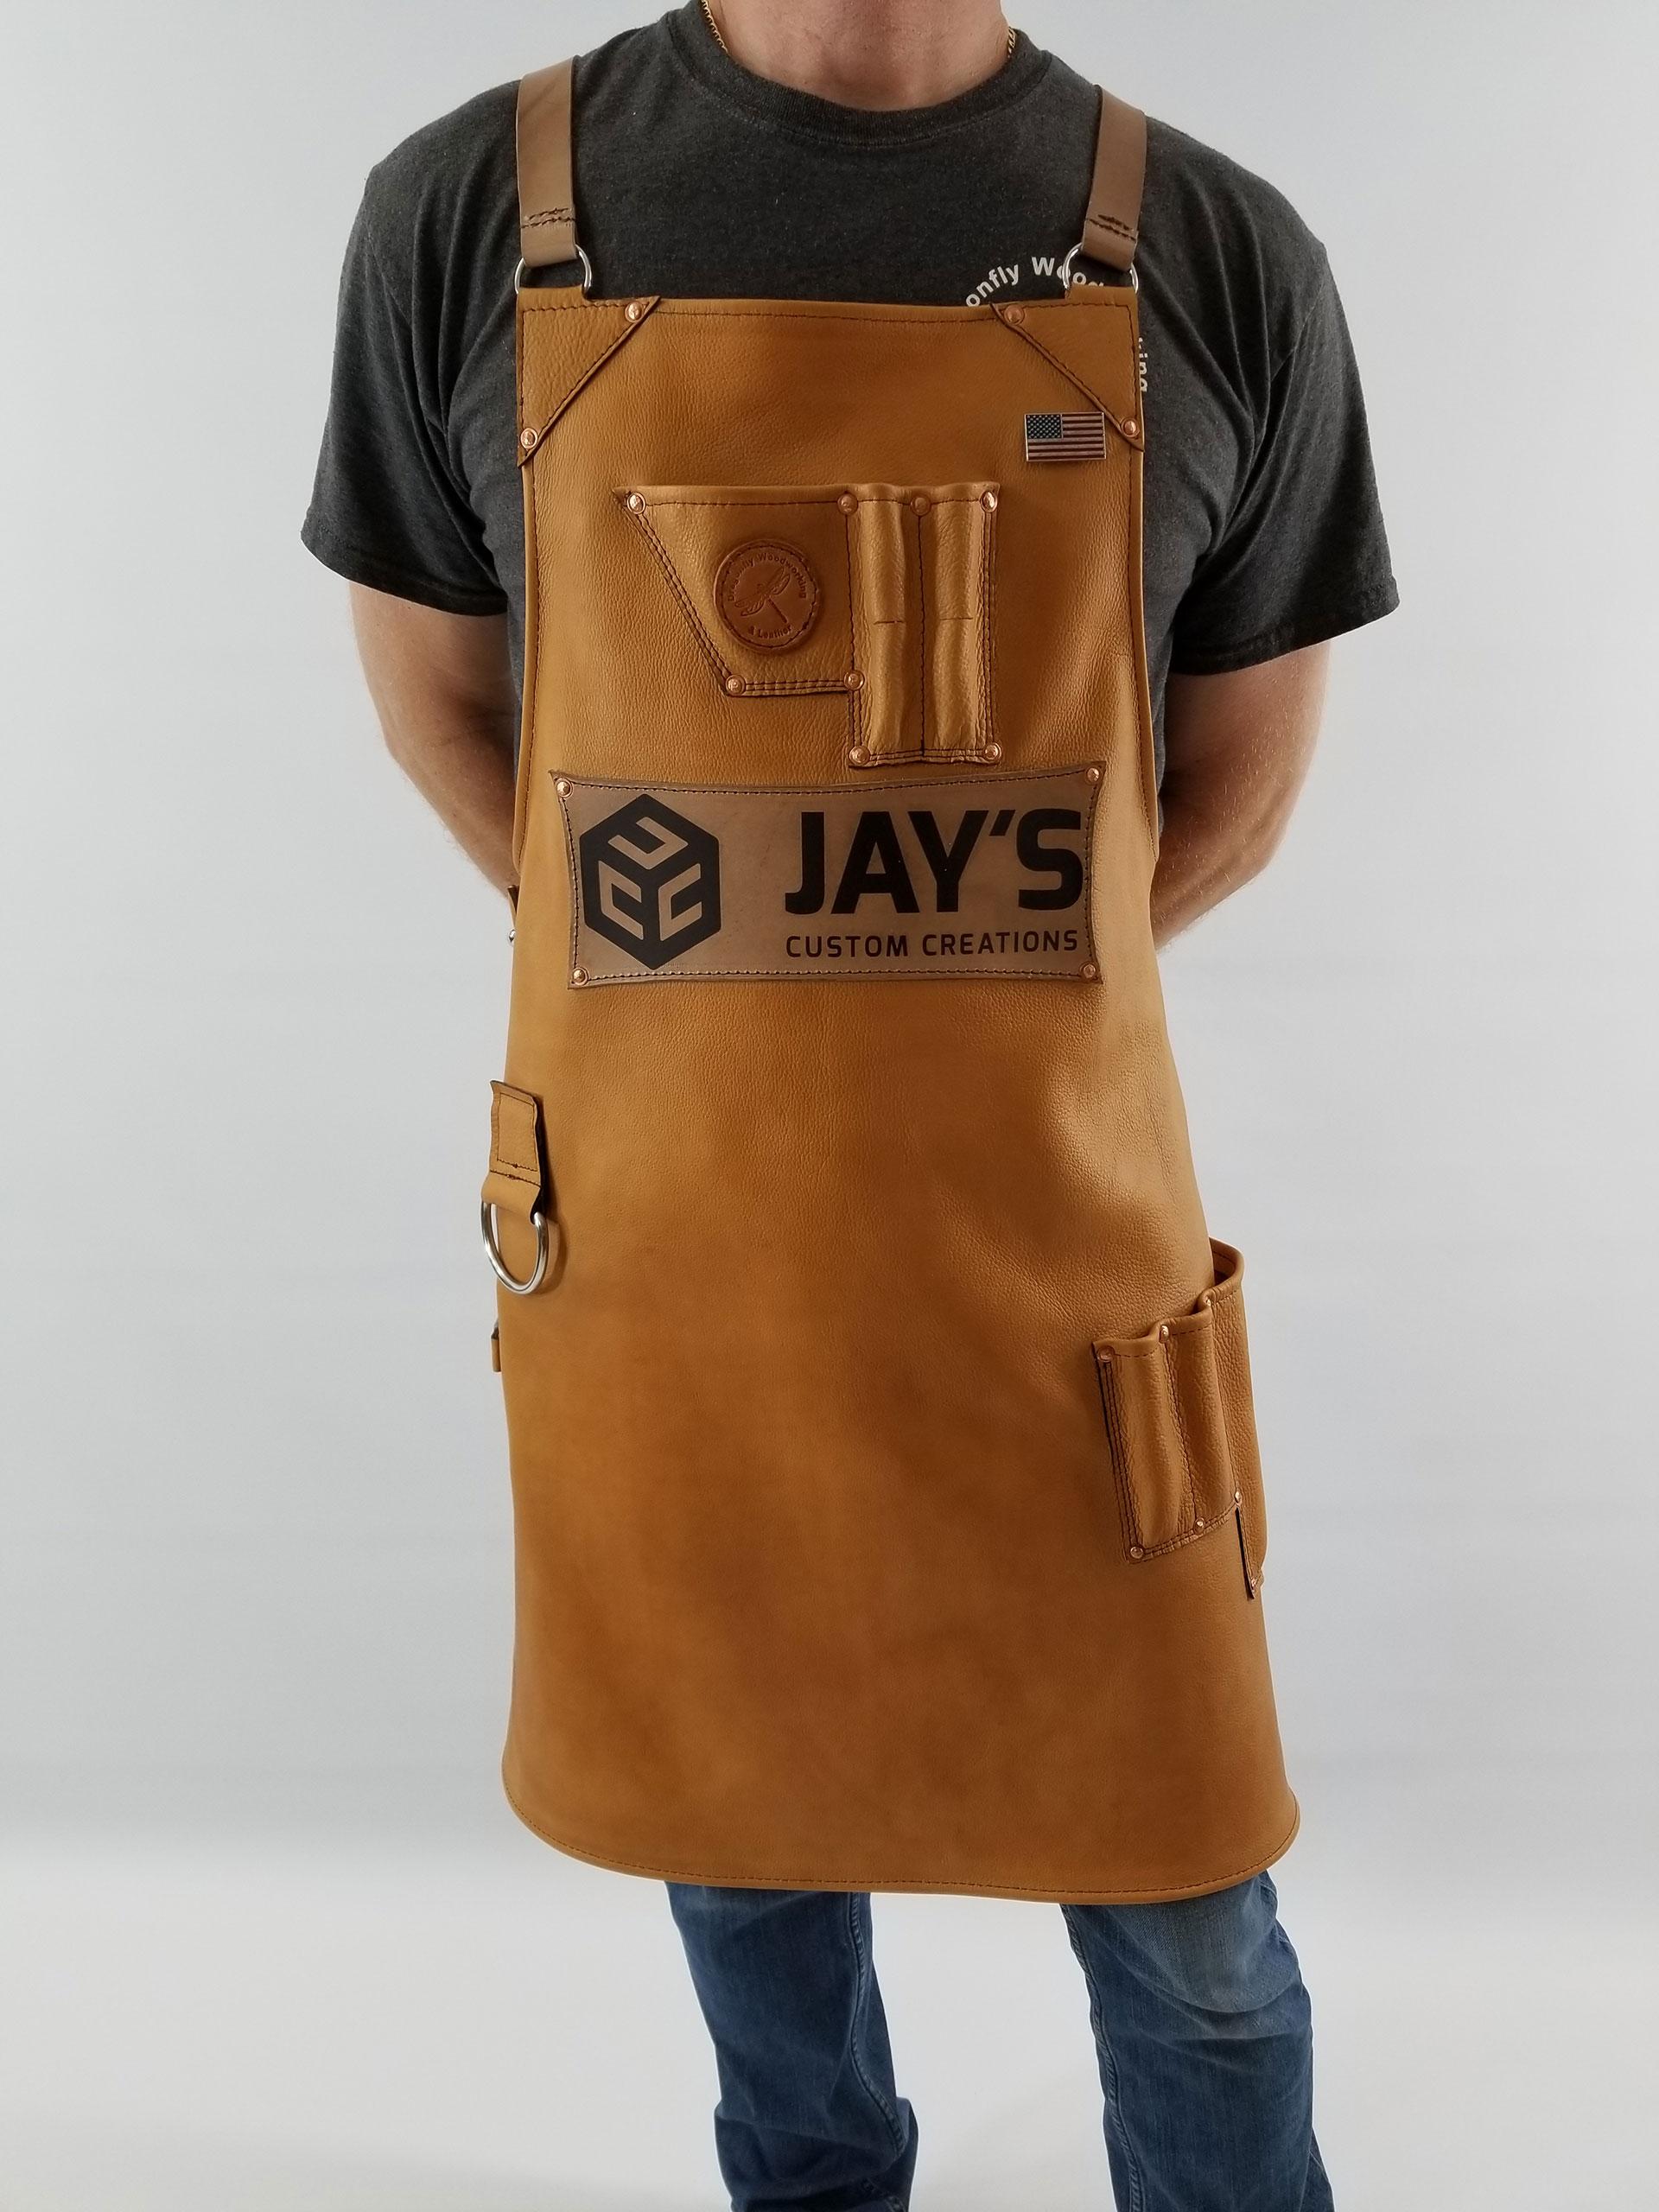 My Custom Shop Apron | Jays Custom Creations